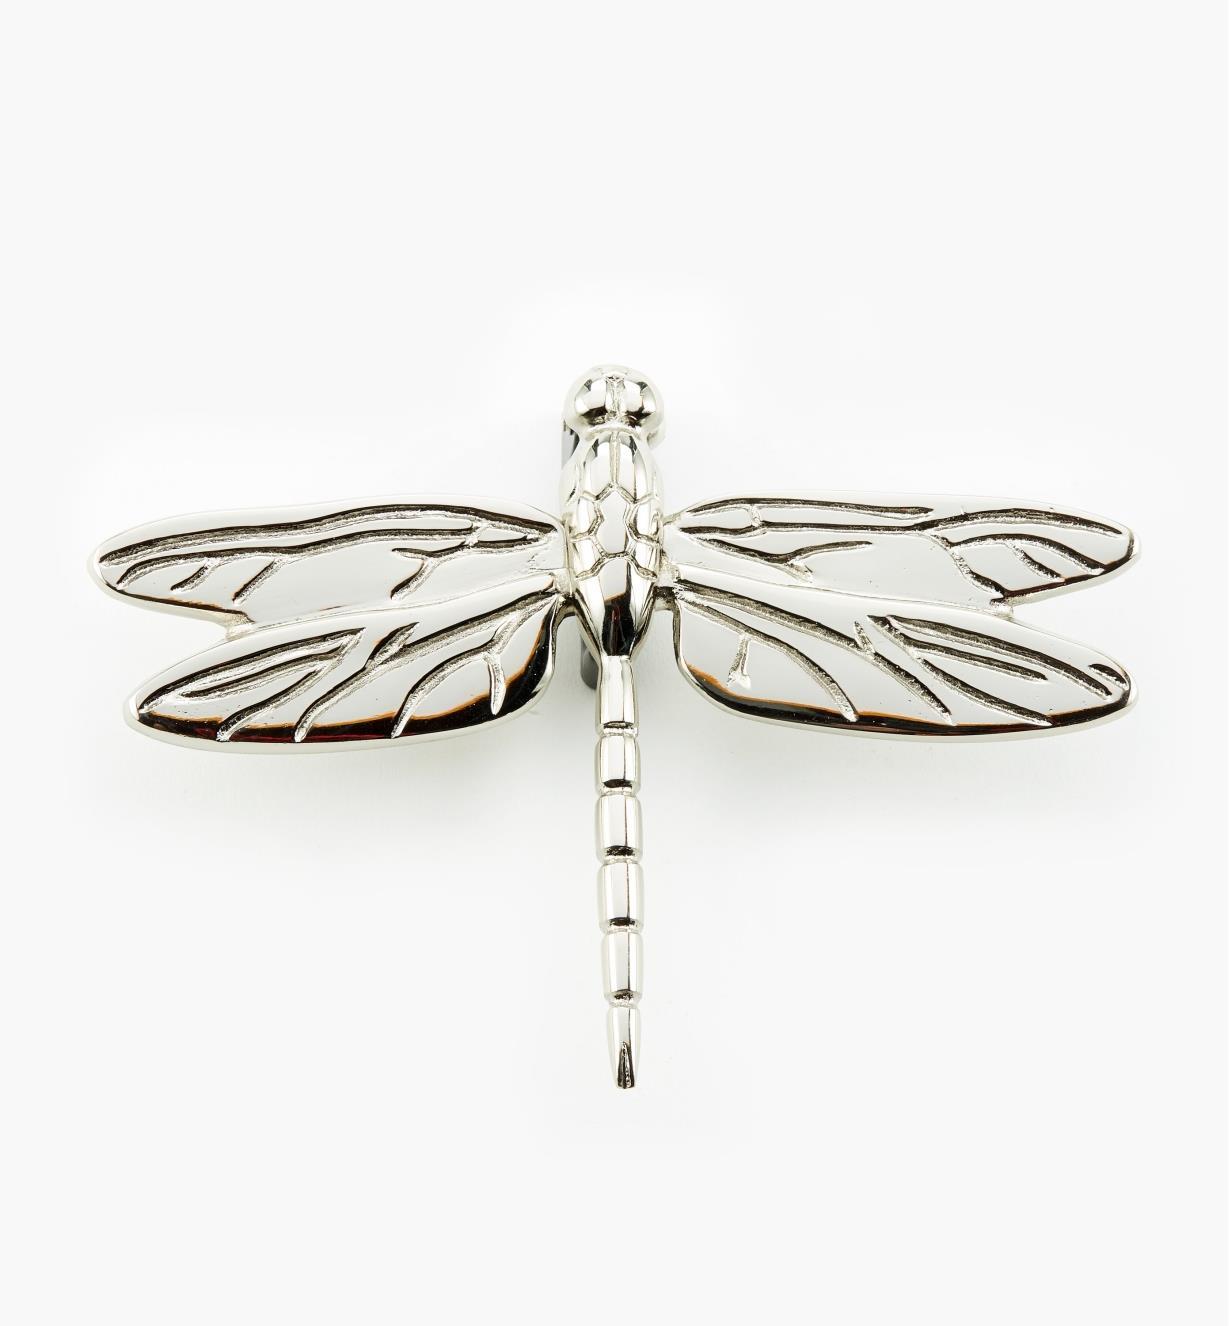 00W0813 - Satin Nickel Dragonfly Door Knocker